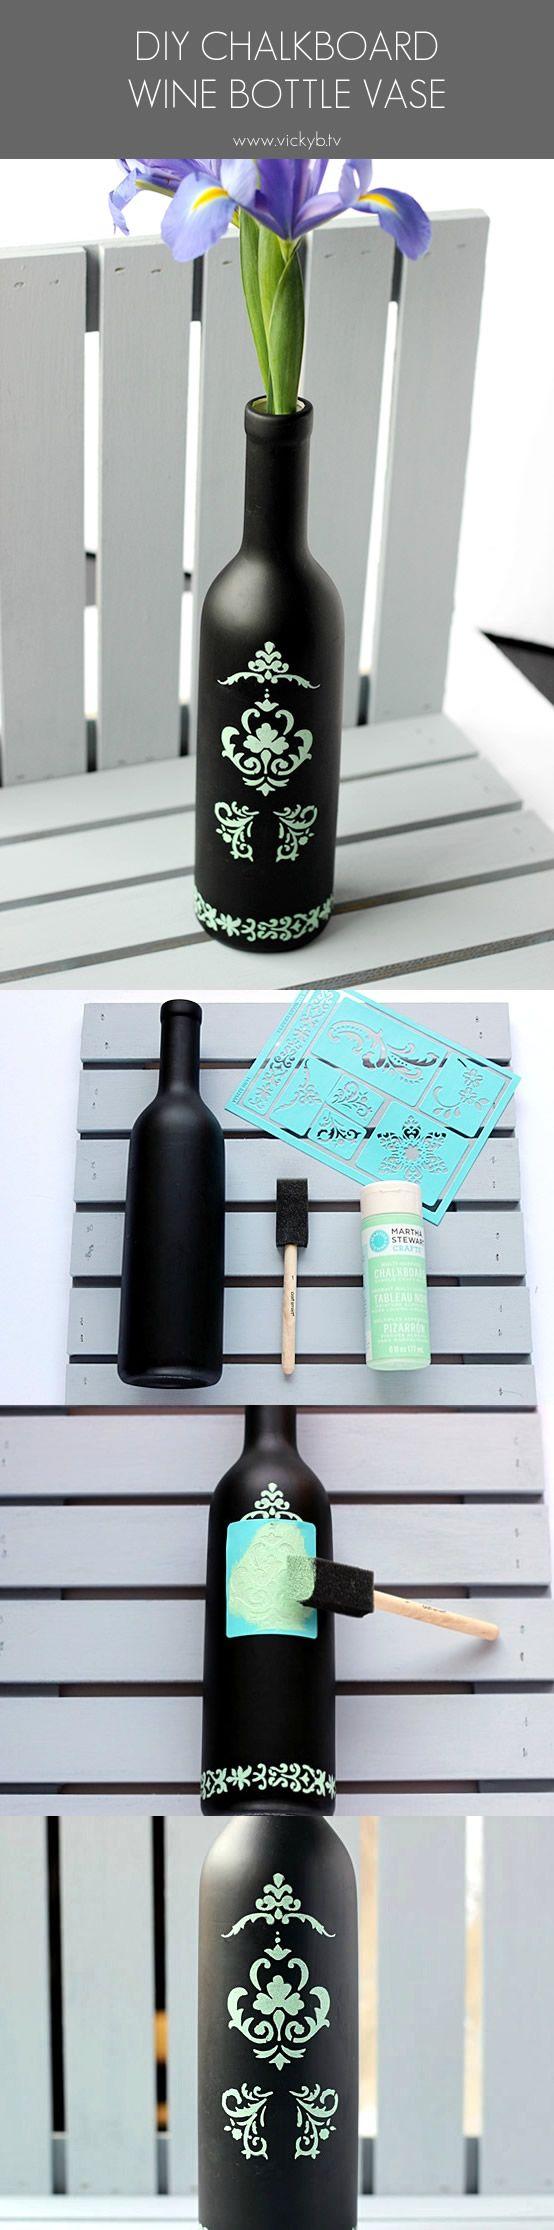 DIY Chalkboard Wine Bottle Vase Tutorial - Transform a chalkboard wine bottle into a pretty accent vase with these easy steps.